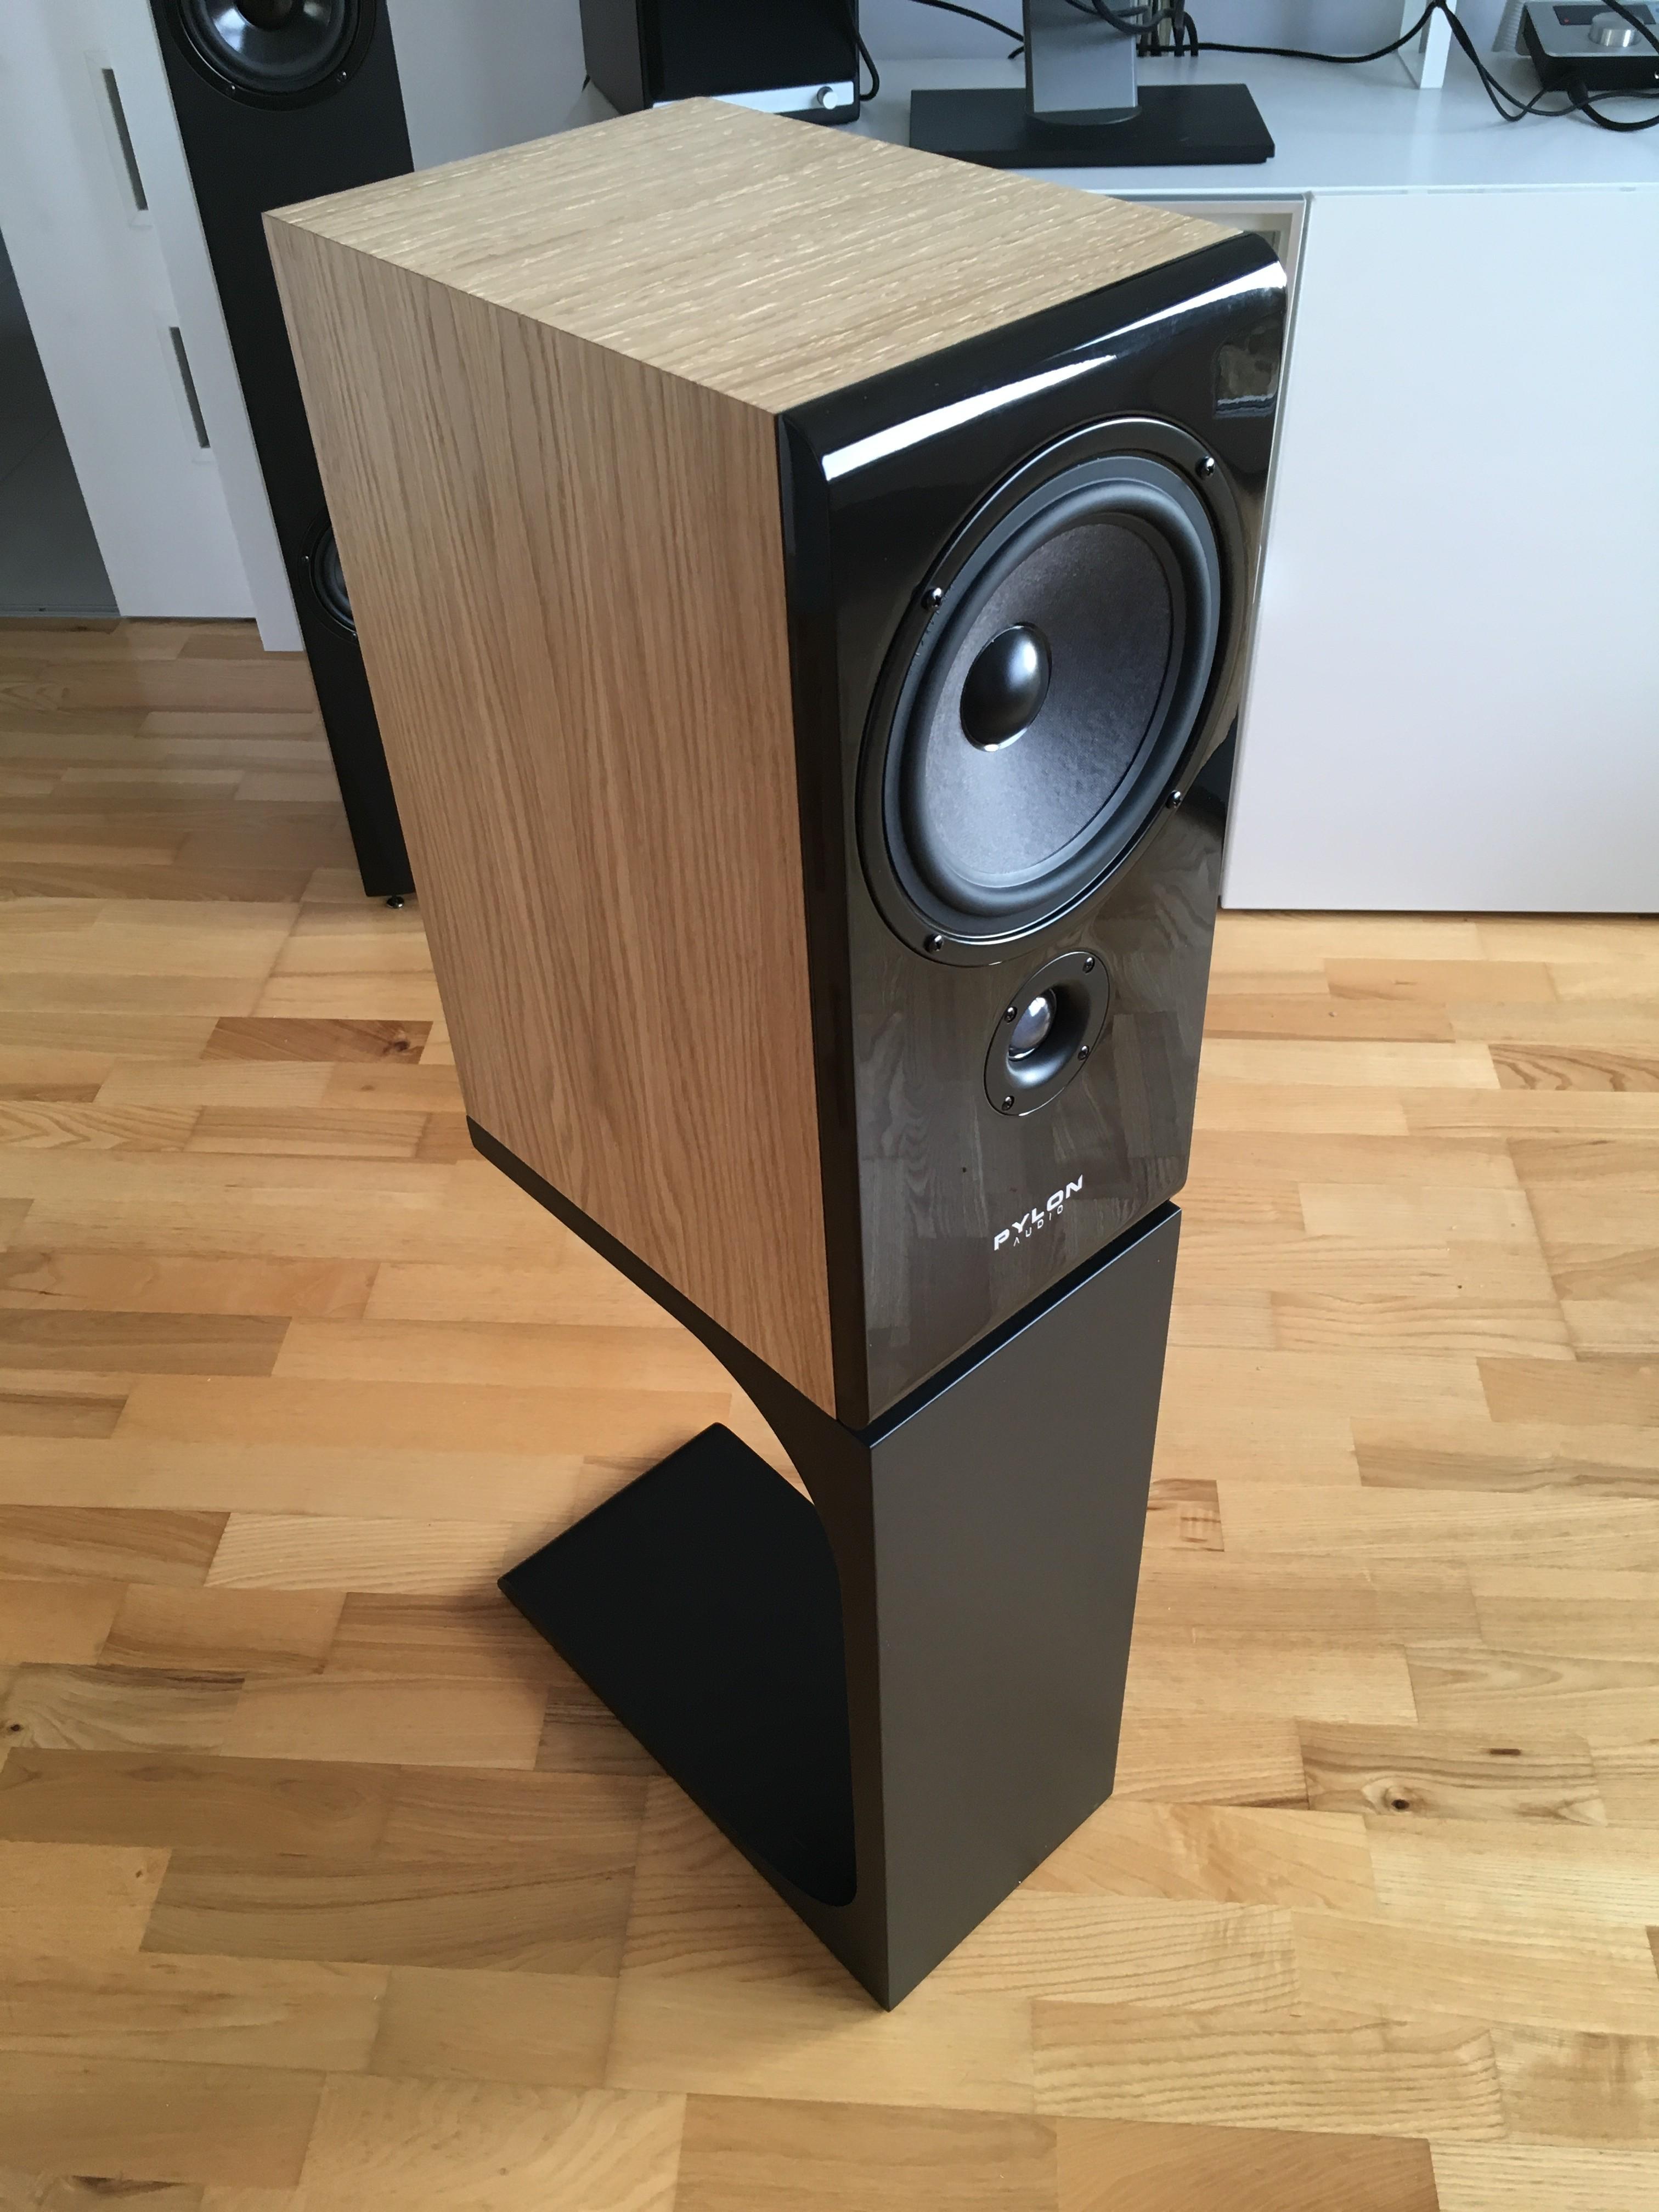 Loa Pylon Audio Opal Monitor hay